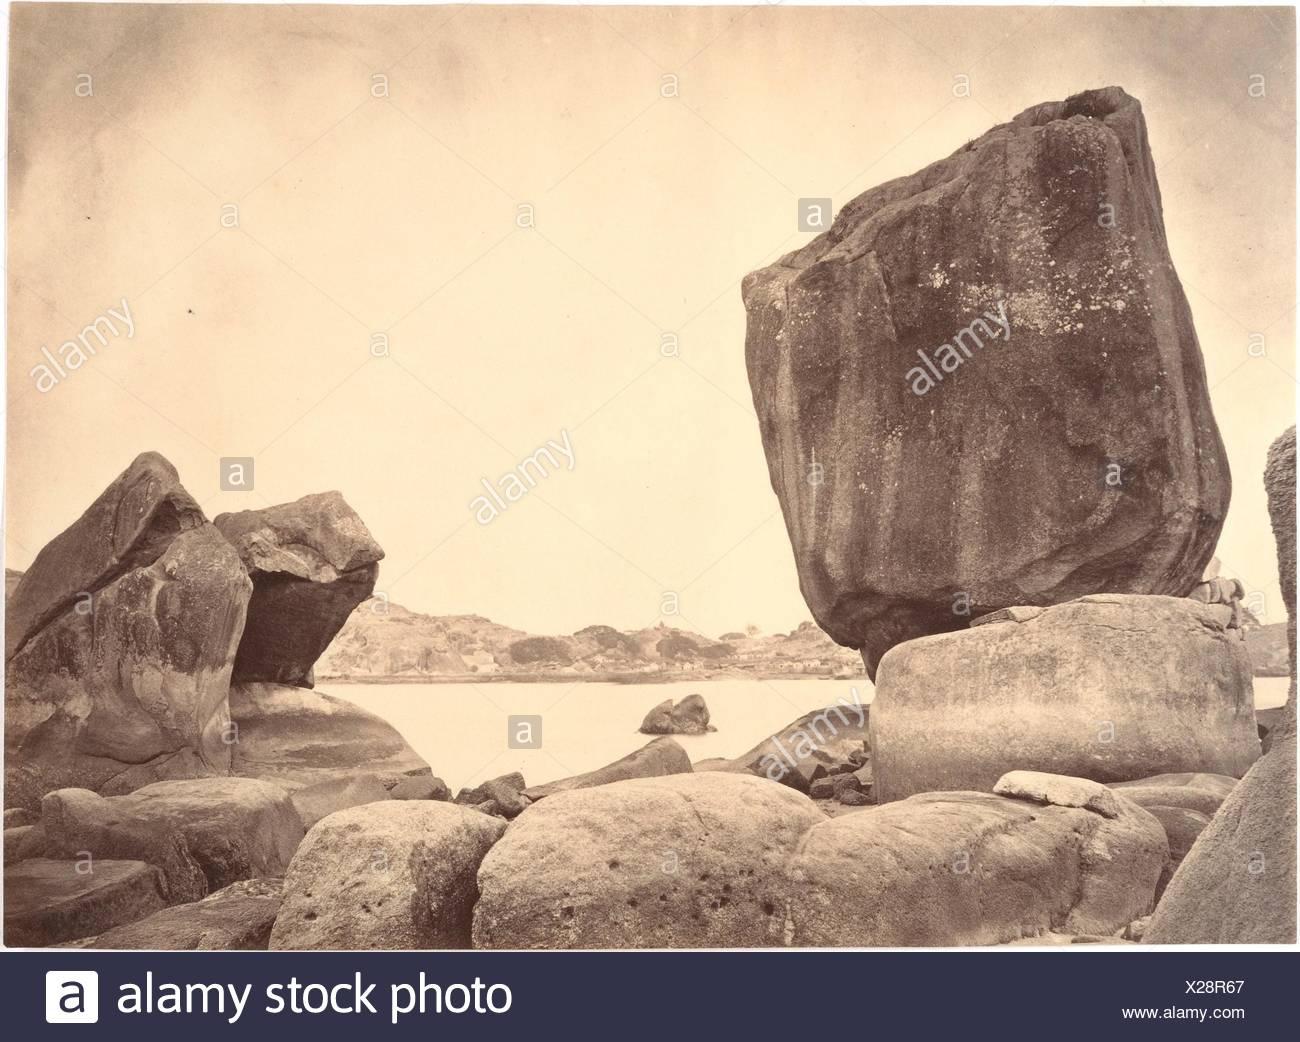 Peculiar shaped Rocks on Roolangsoo Island, Amoy. Artist: John Thomson (British, Edinburgh, Scotland 1837-1921 London); Date: ca. 1869; Medium: - Stock Image